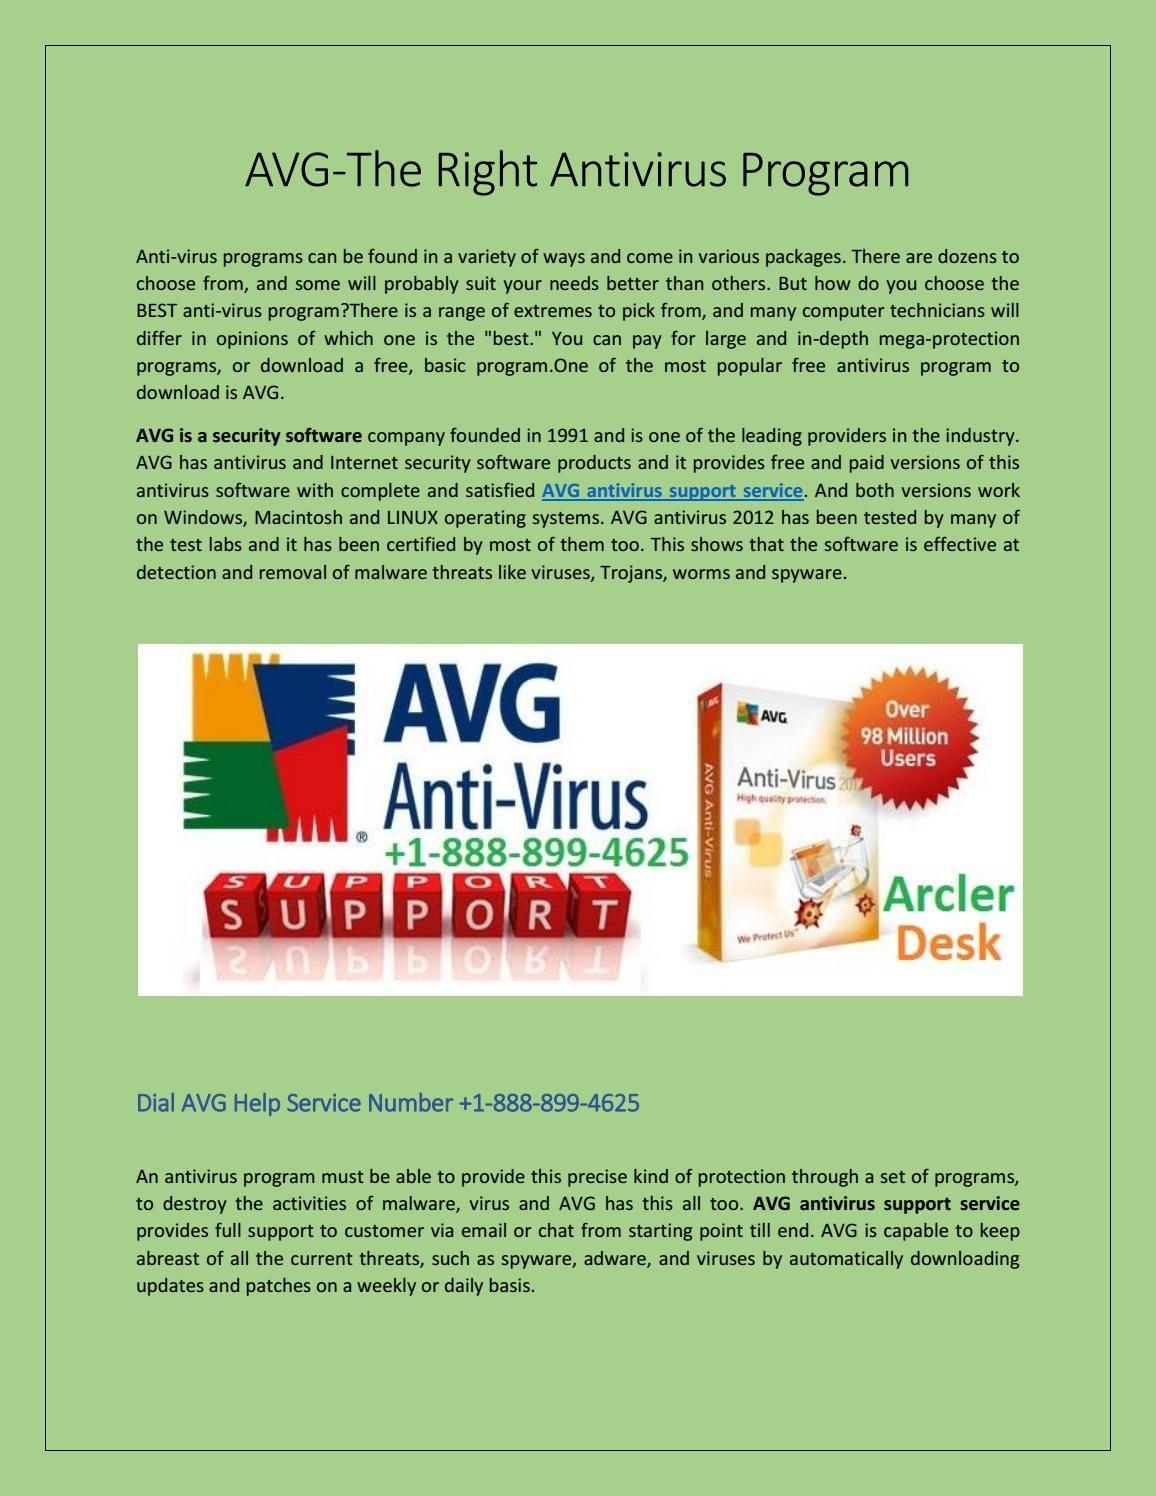 Download free AVG antivirus | Safe & Secure PC | Antivirus